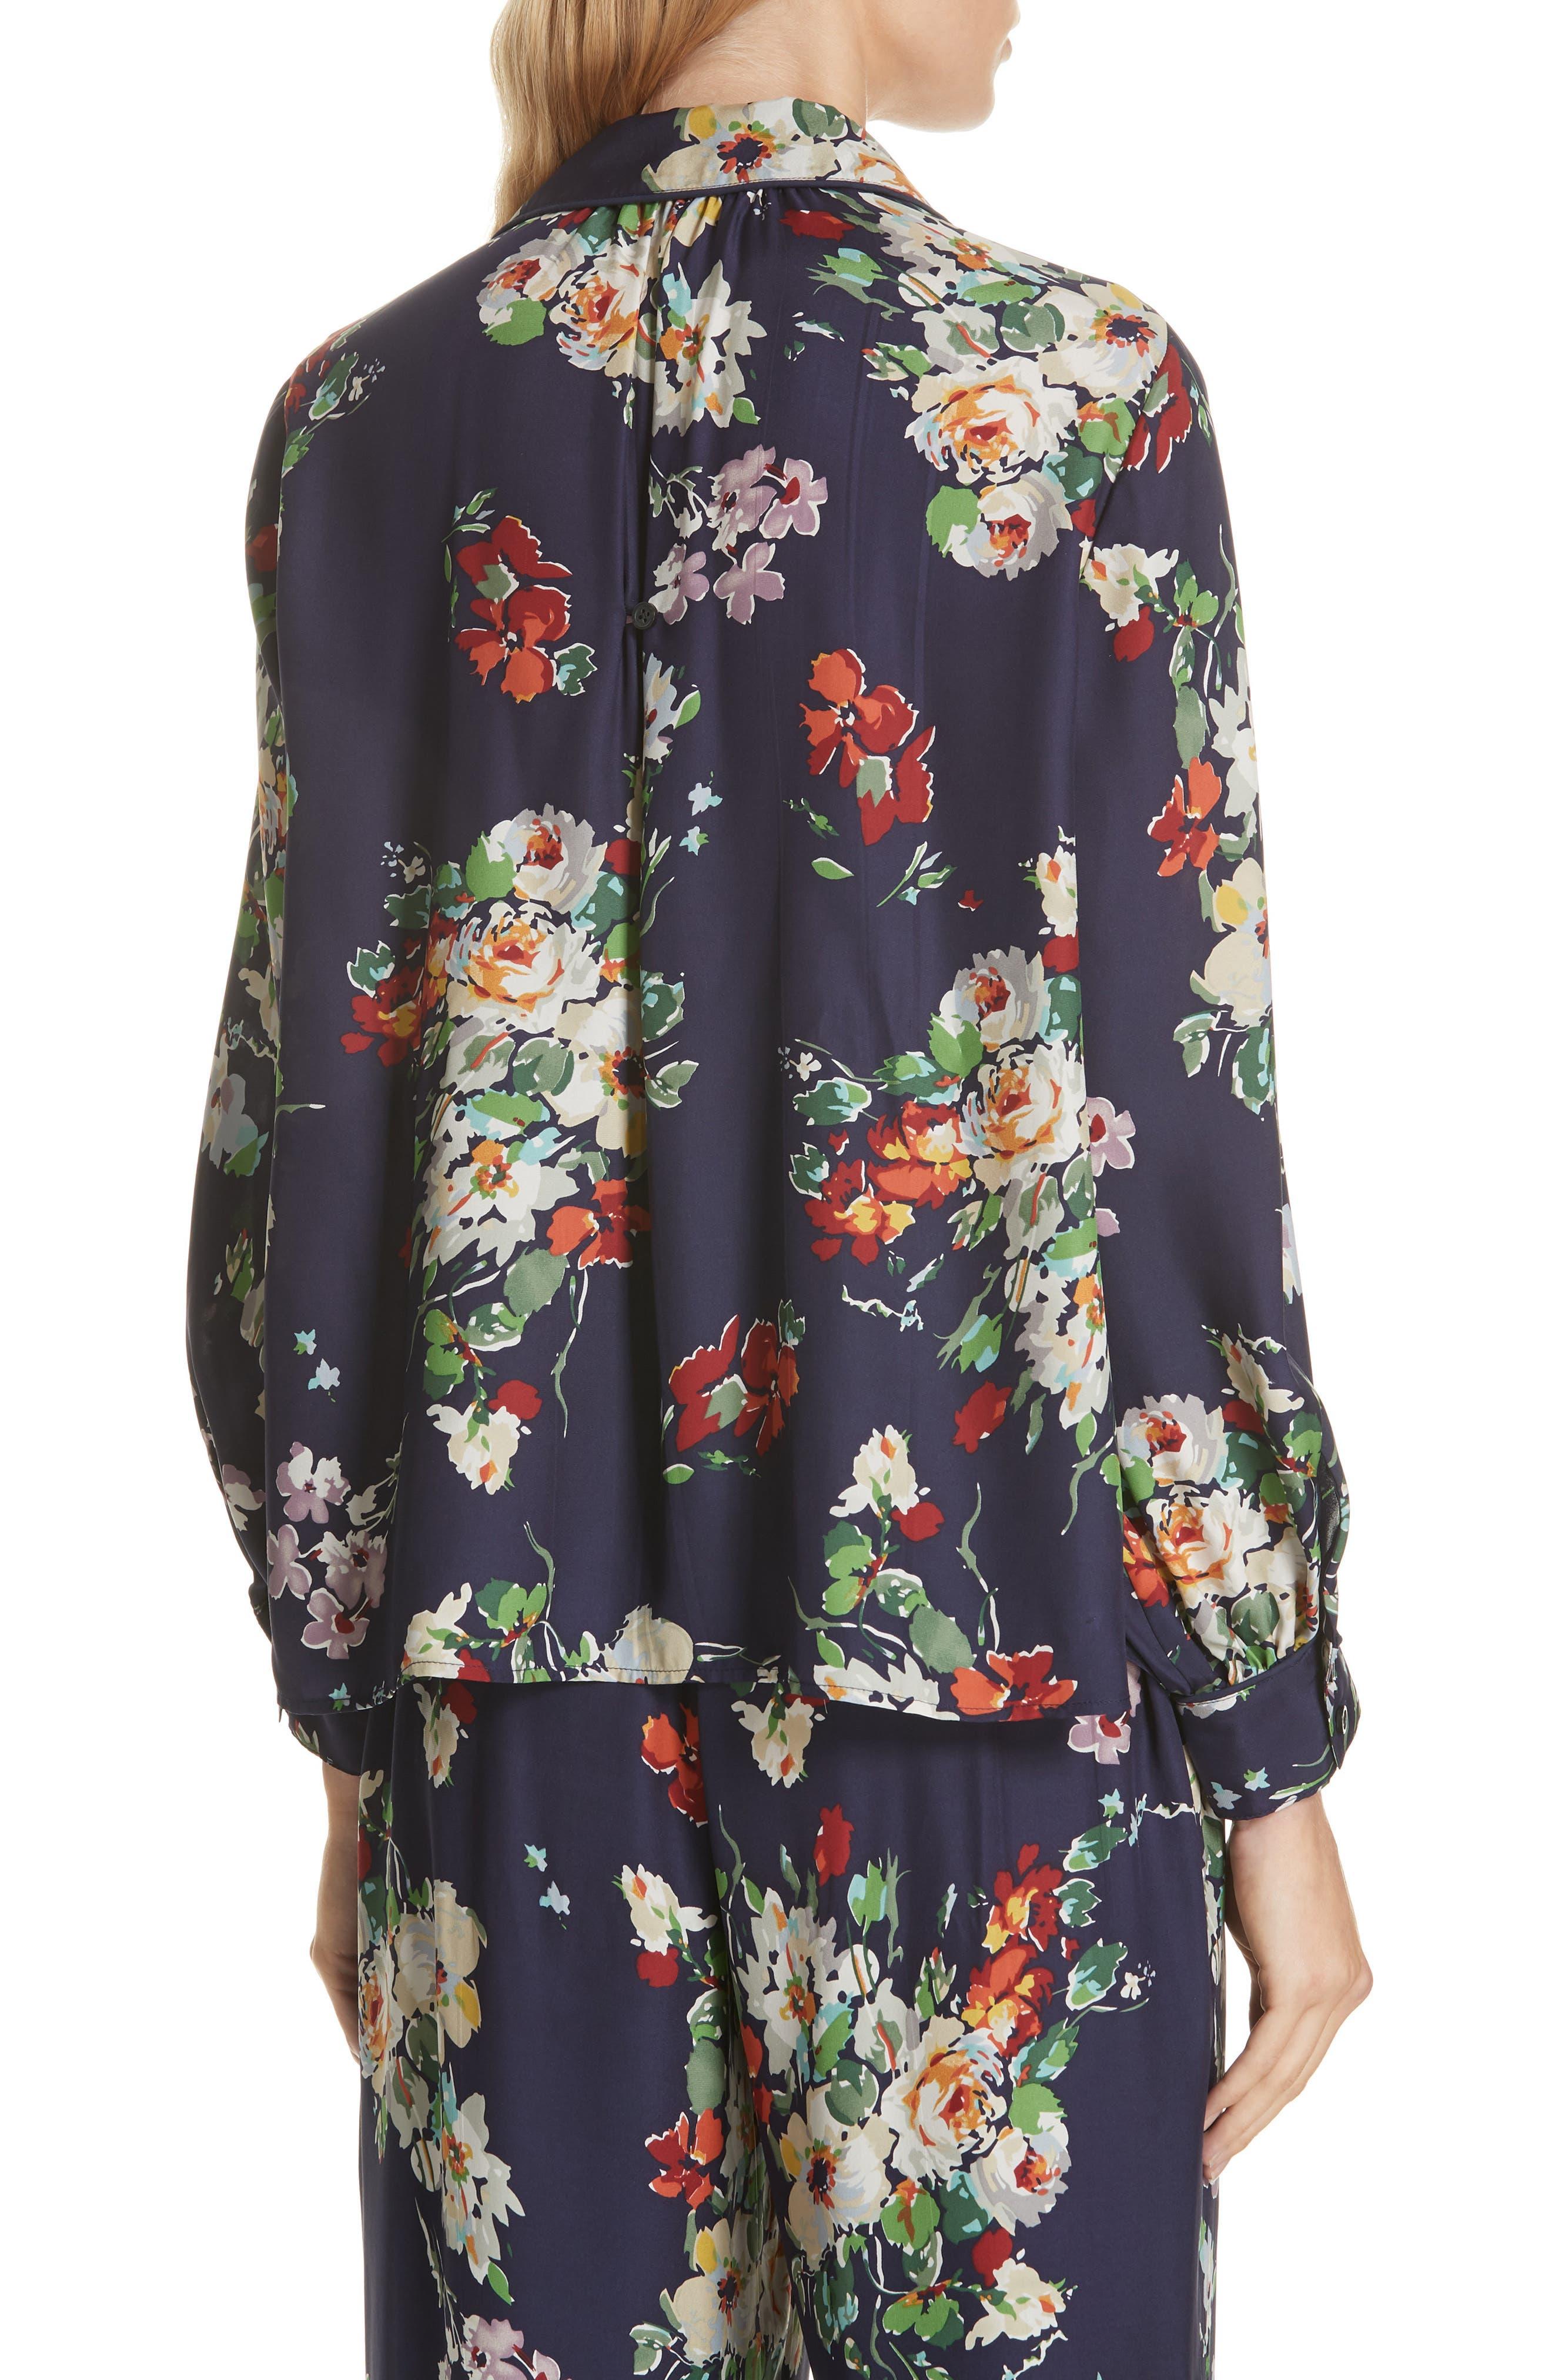 Floral Silk Blouse,                             Alternate thumbnail 2, color,                             NIGHTFALL FLORAL PRINT